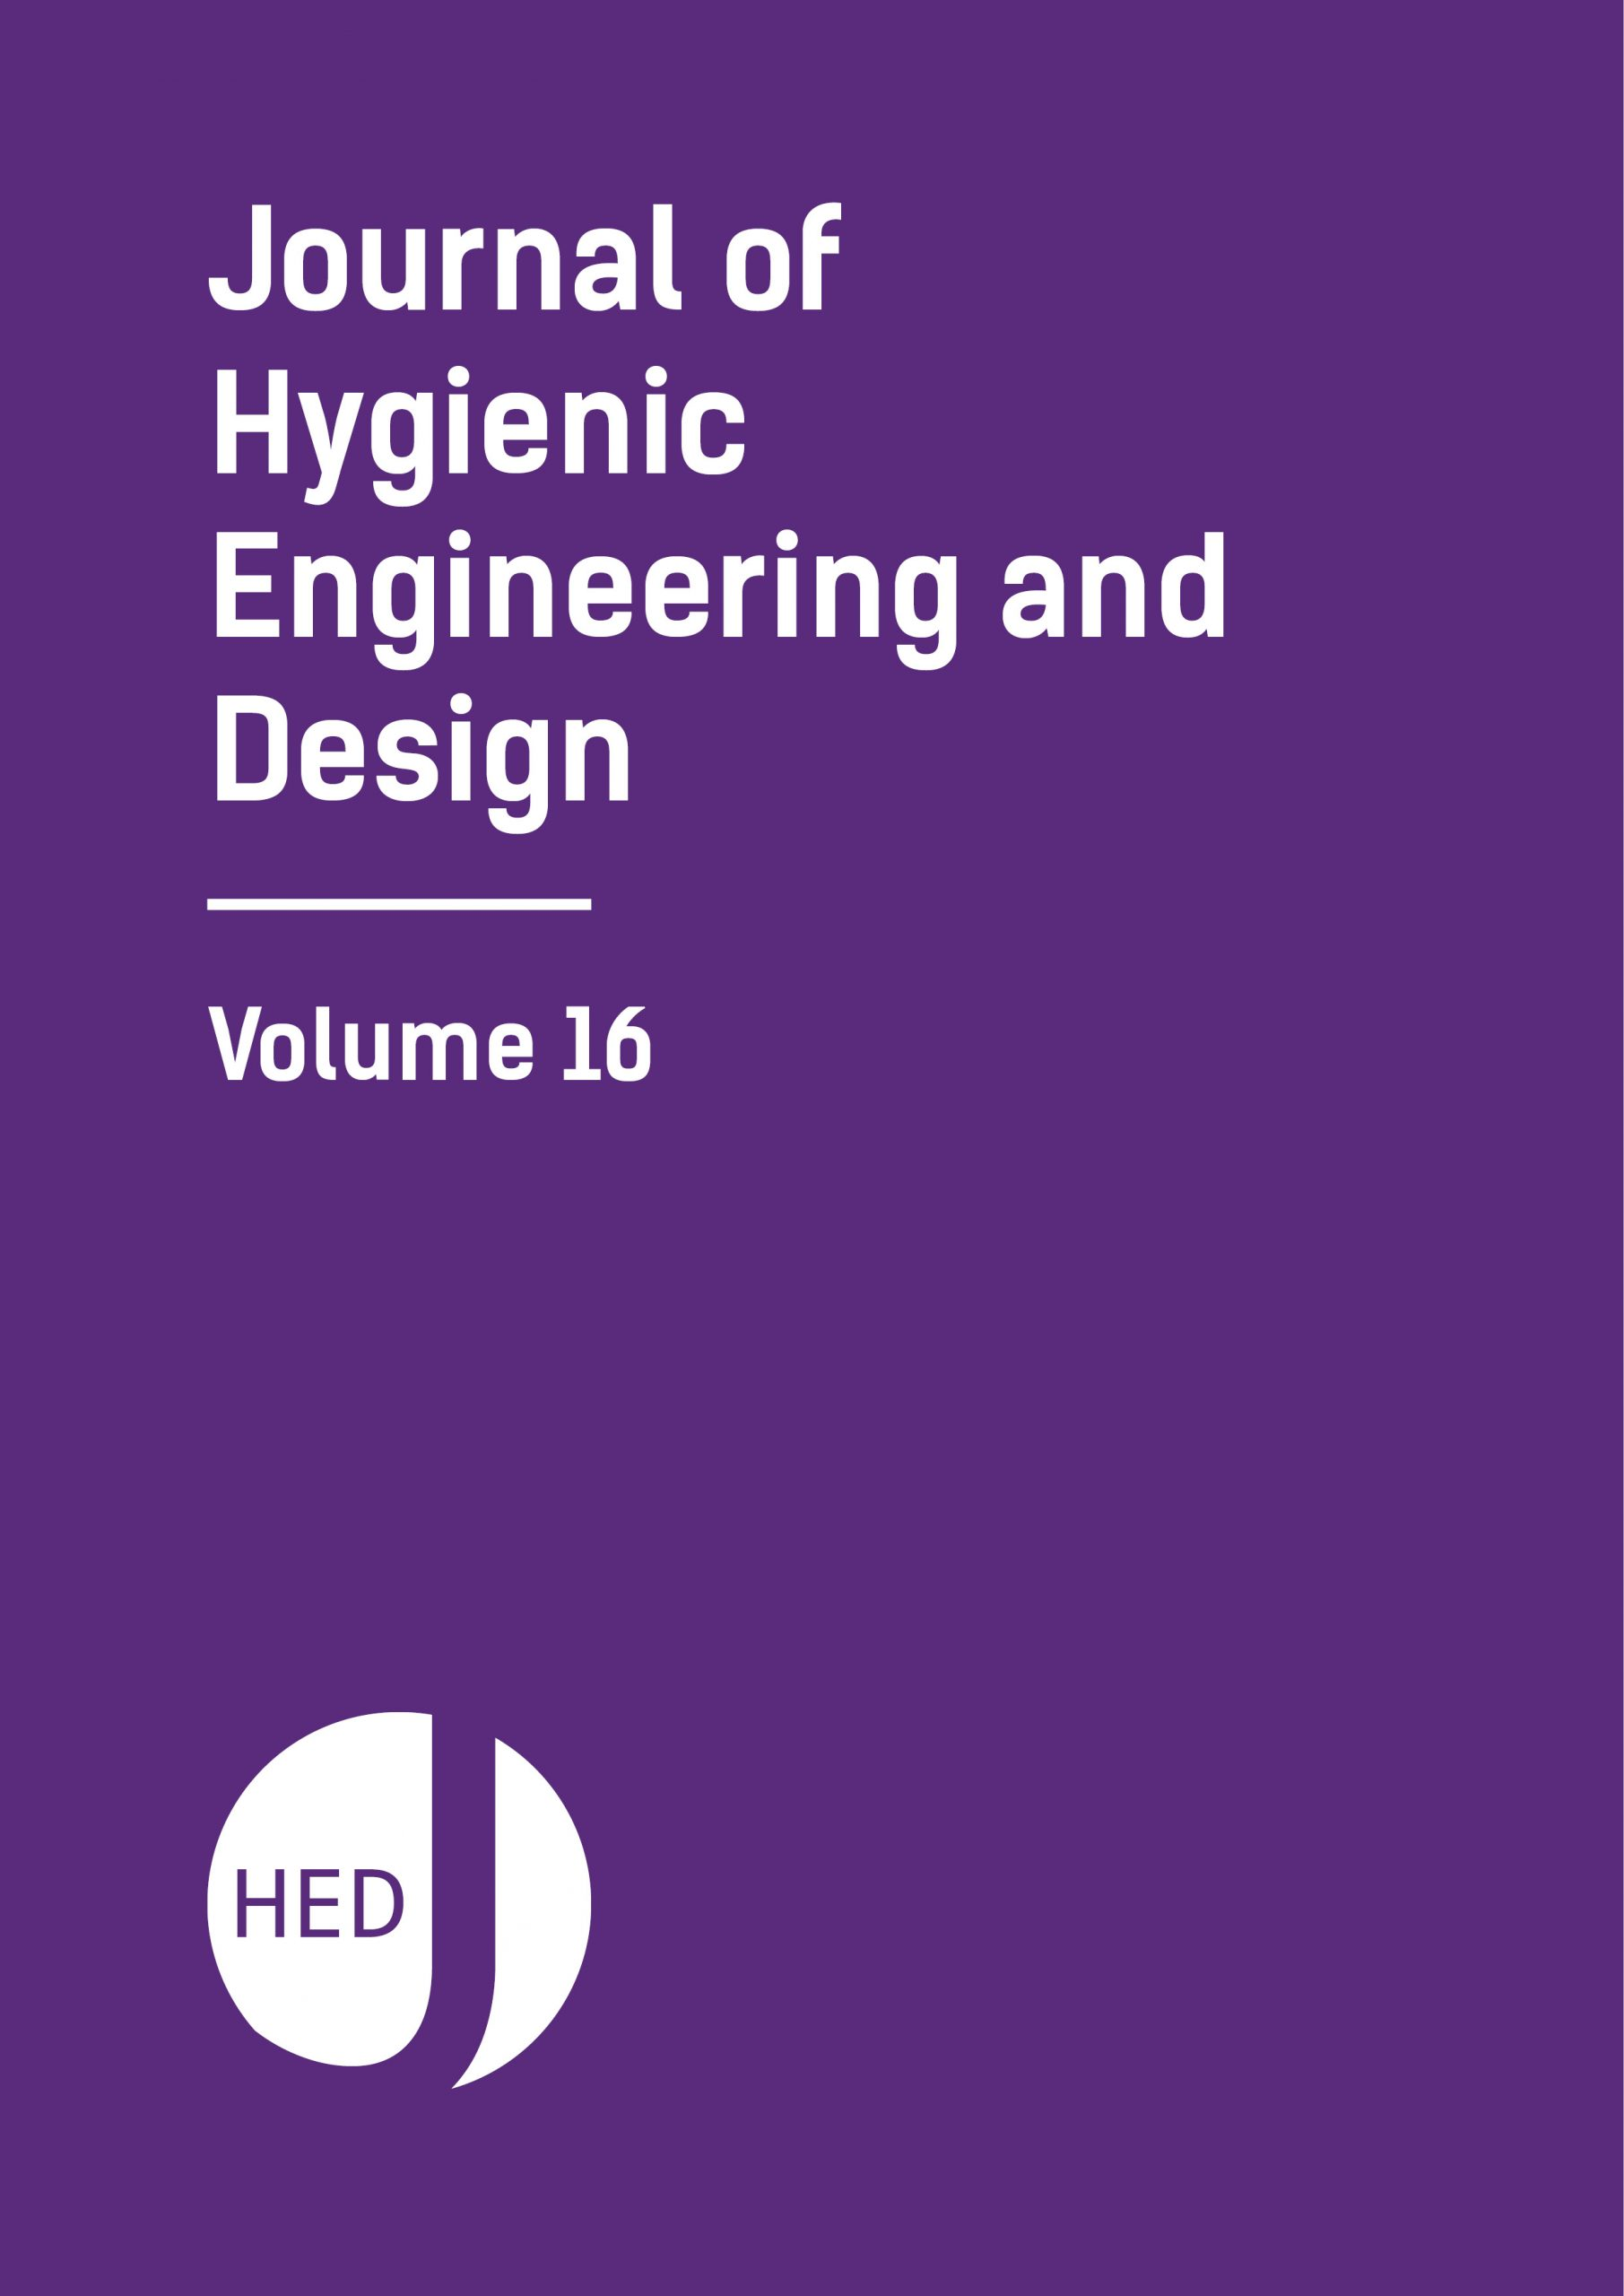 JHED Volume 16